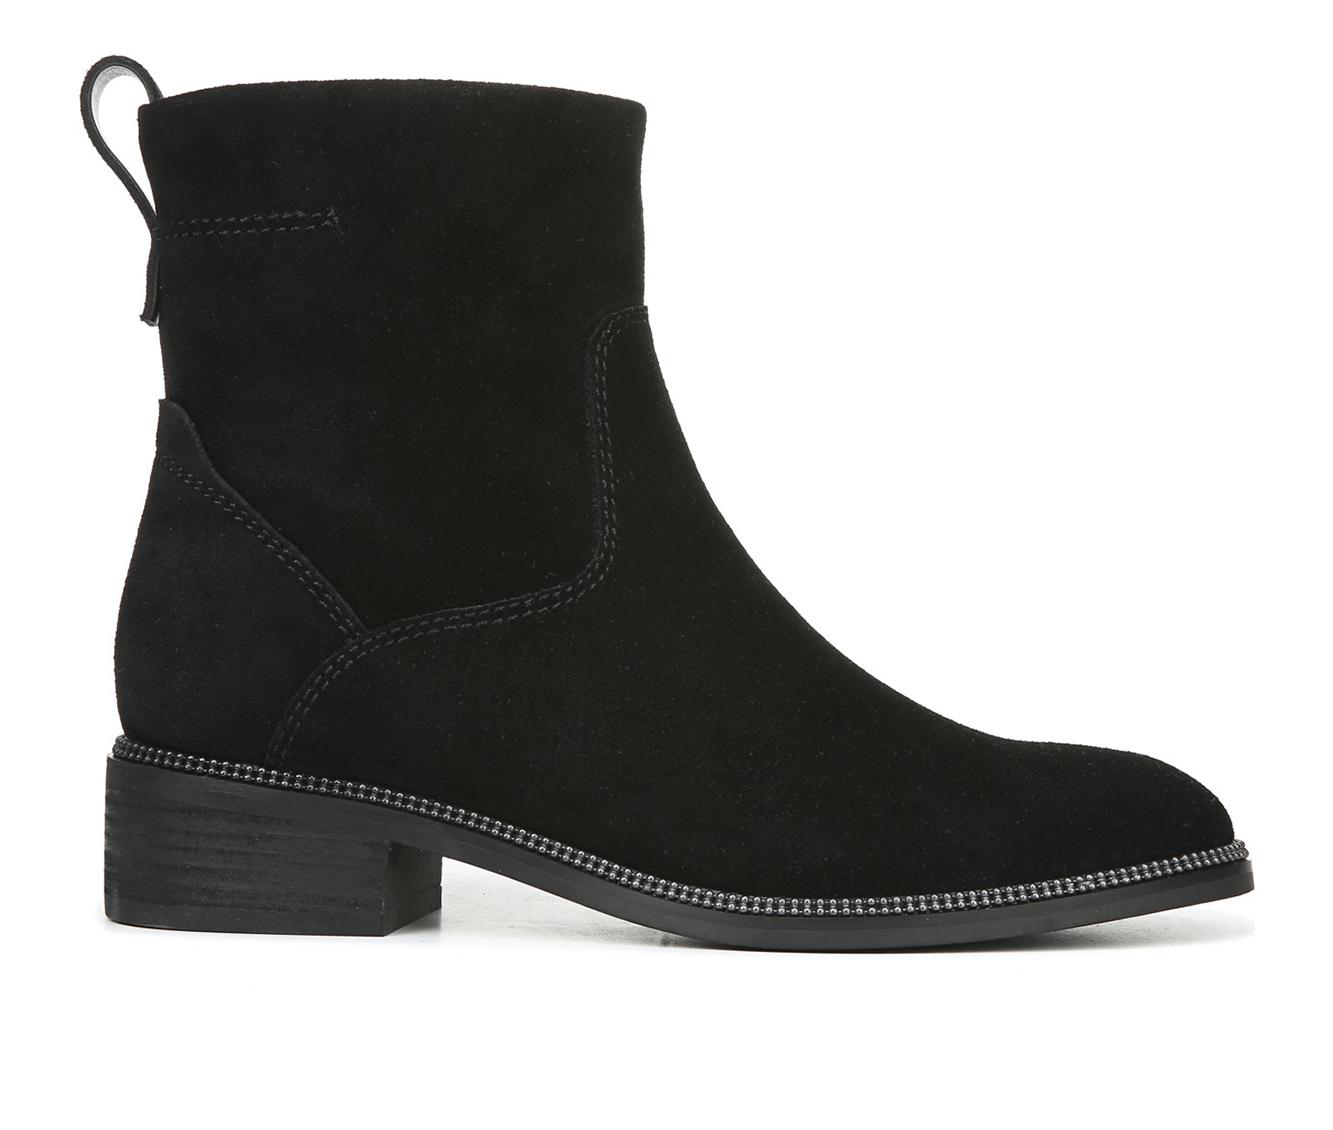 Franco Sarto Brindle Women's Boots (Black - Leather)